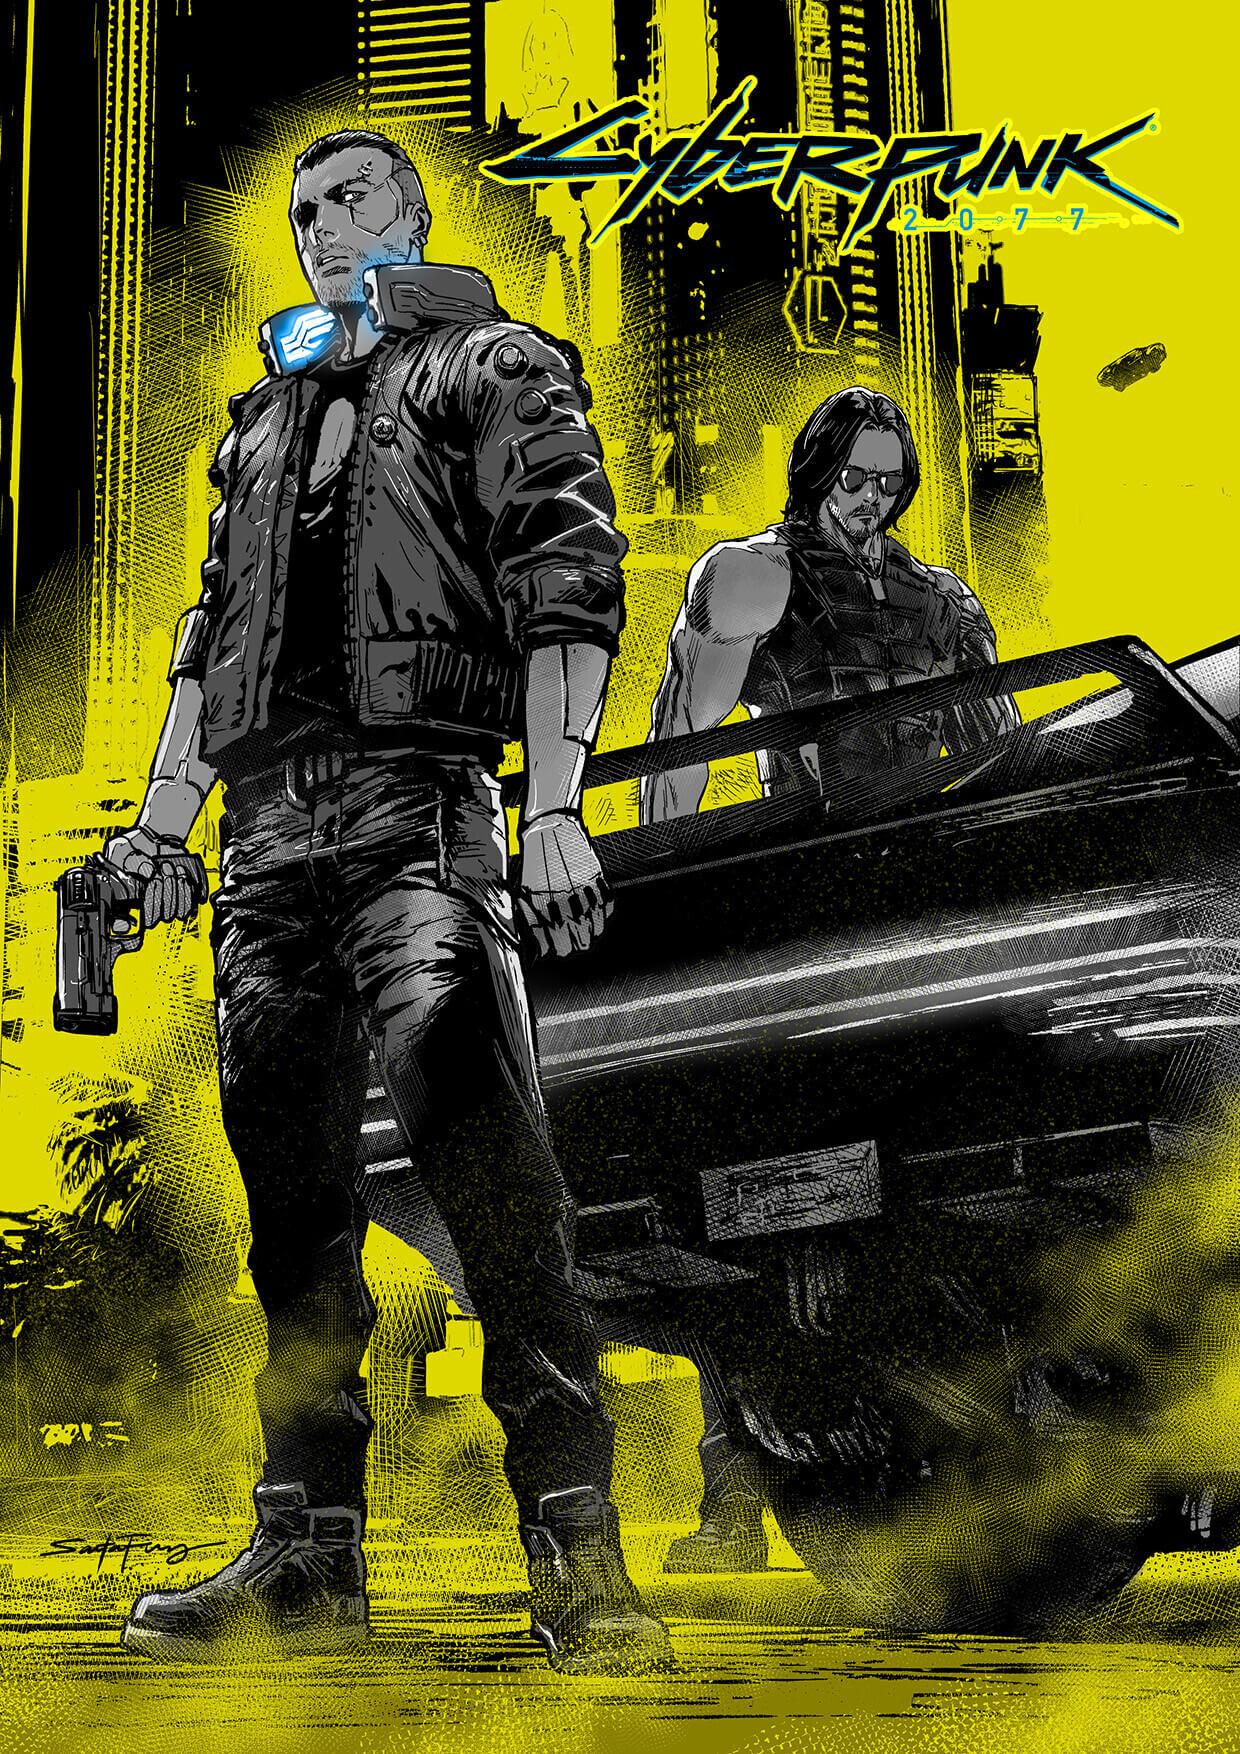 SANTA FUNG – Cyberpunk 2077